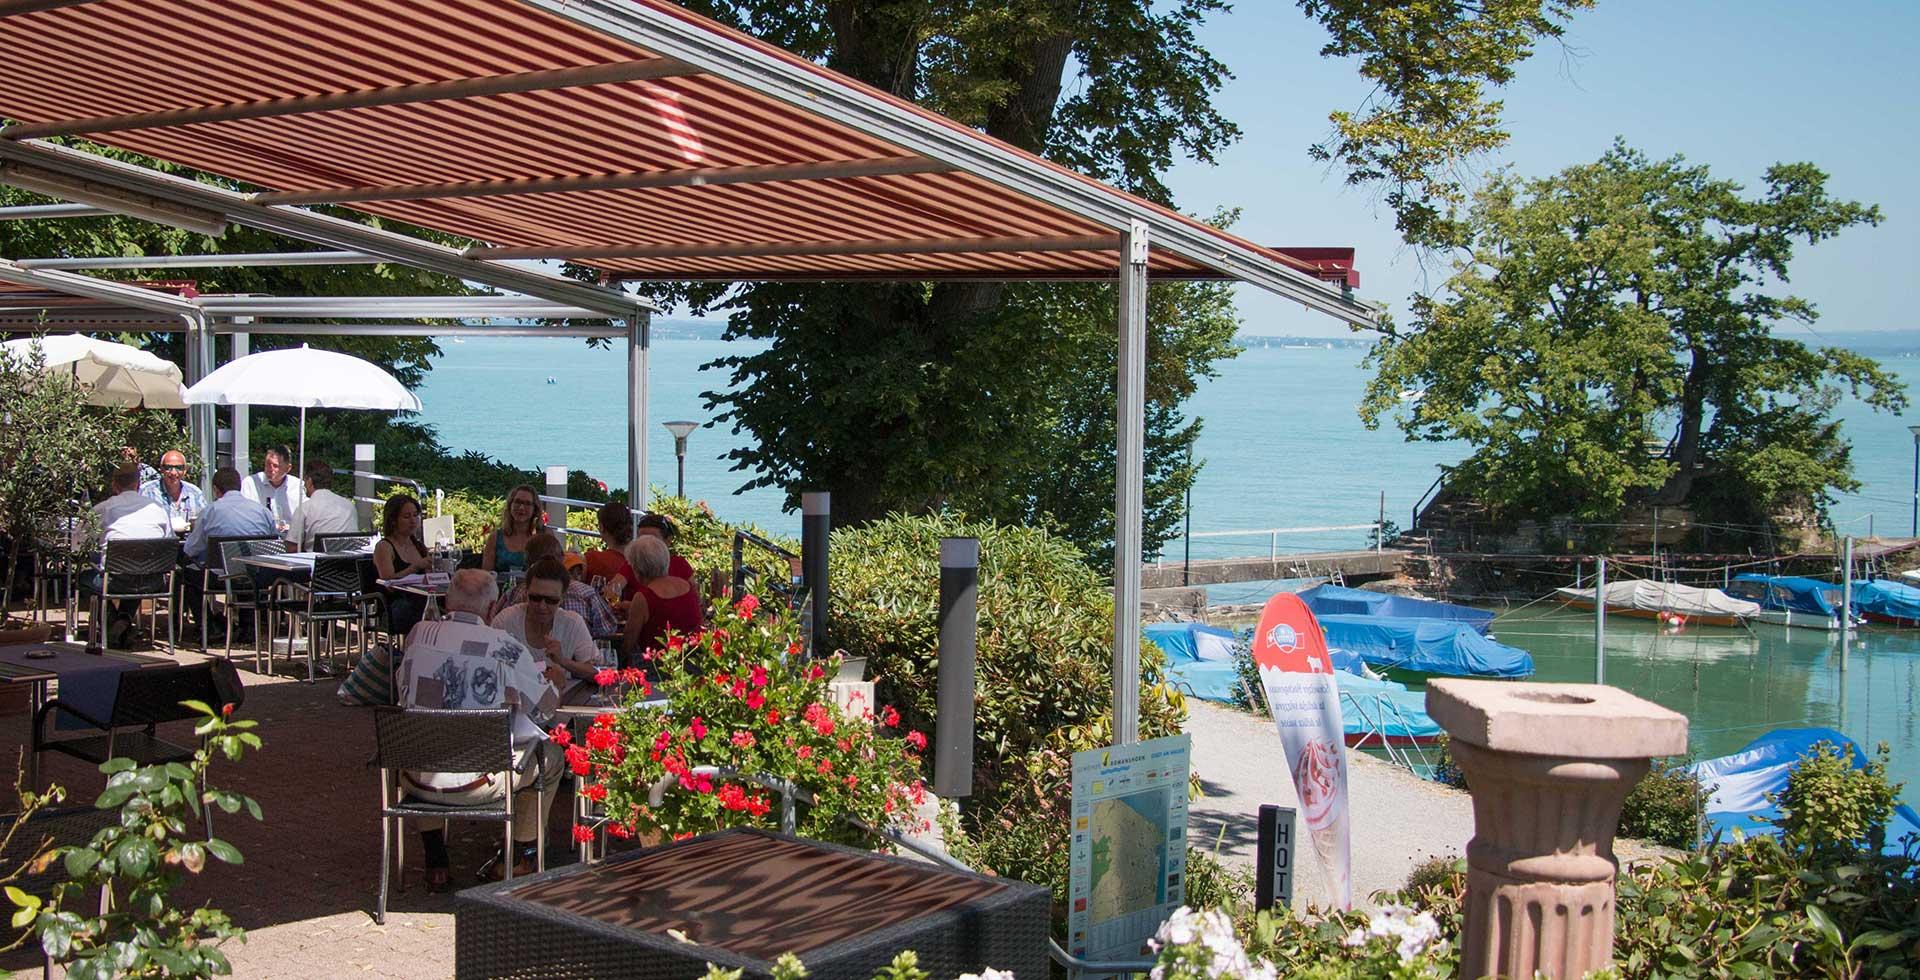 Slide-Terrasse-Park-Hotel-Inseli-MG_0244-1920x980